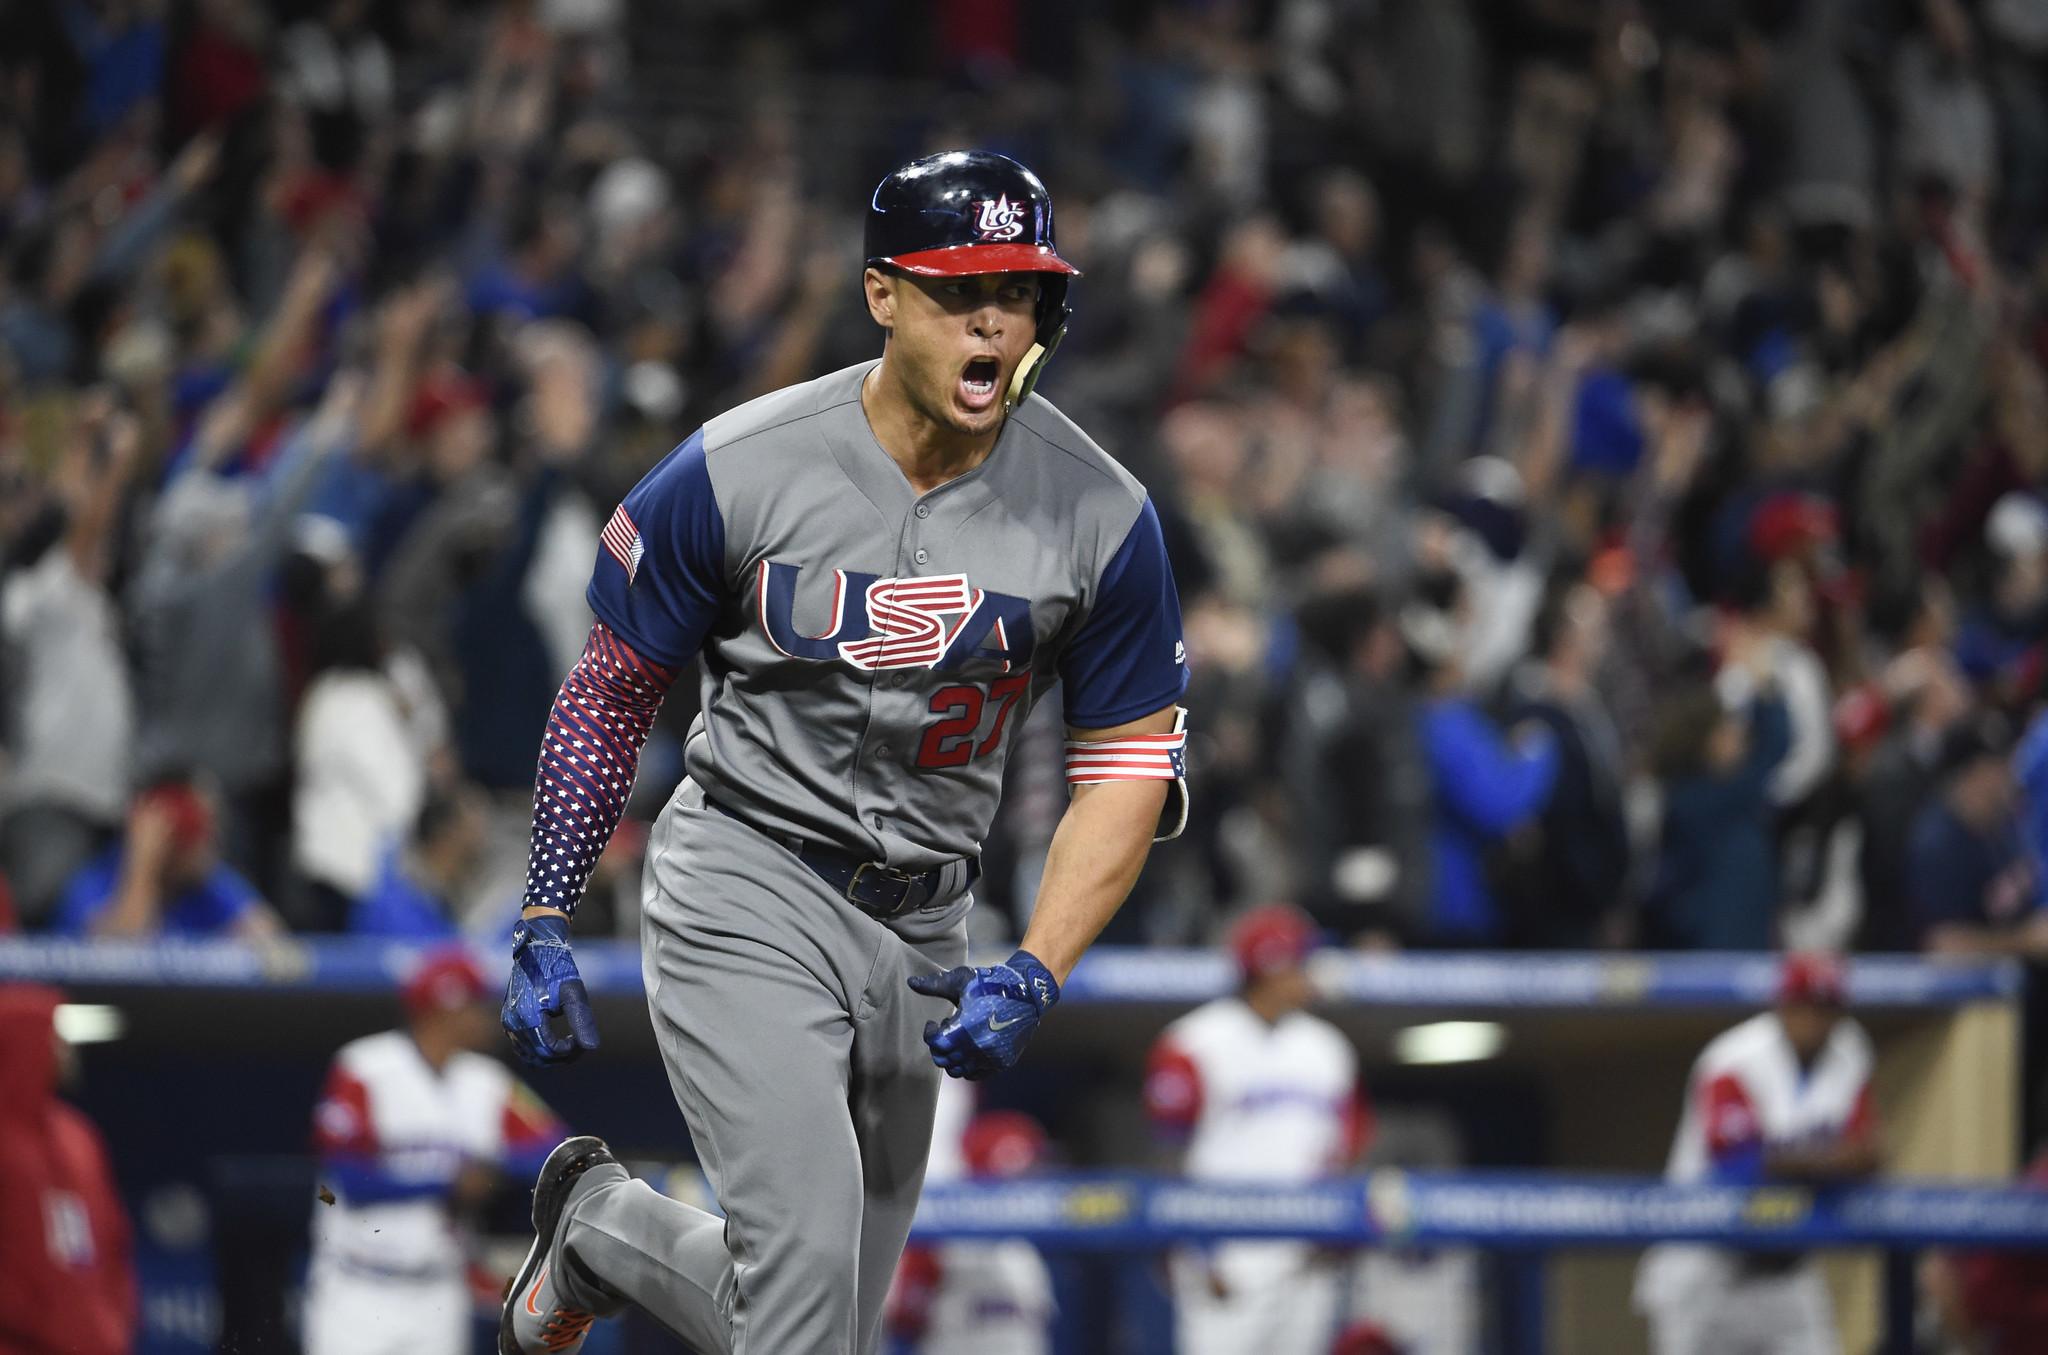 Fl-sp-united-states-world-baseball-classic-stanton-20170319